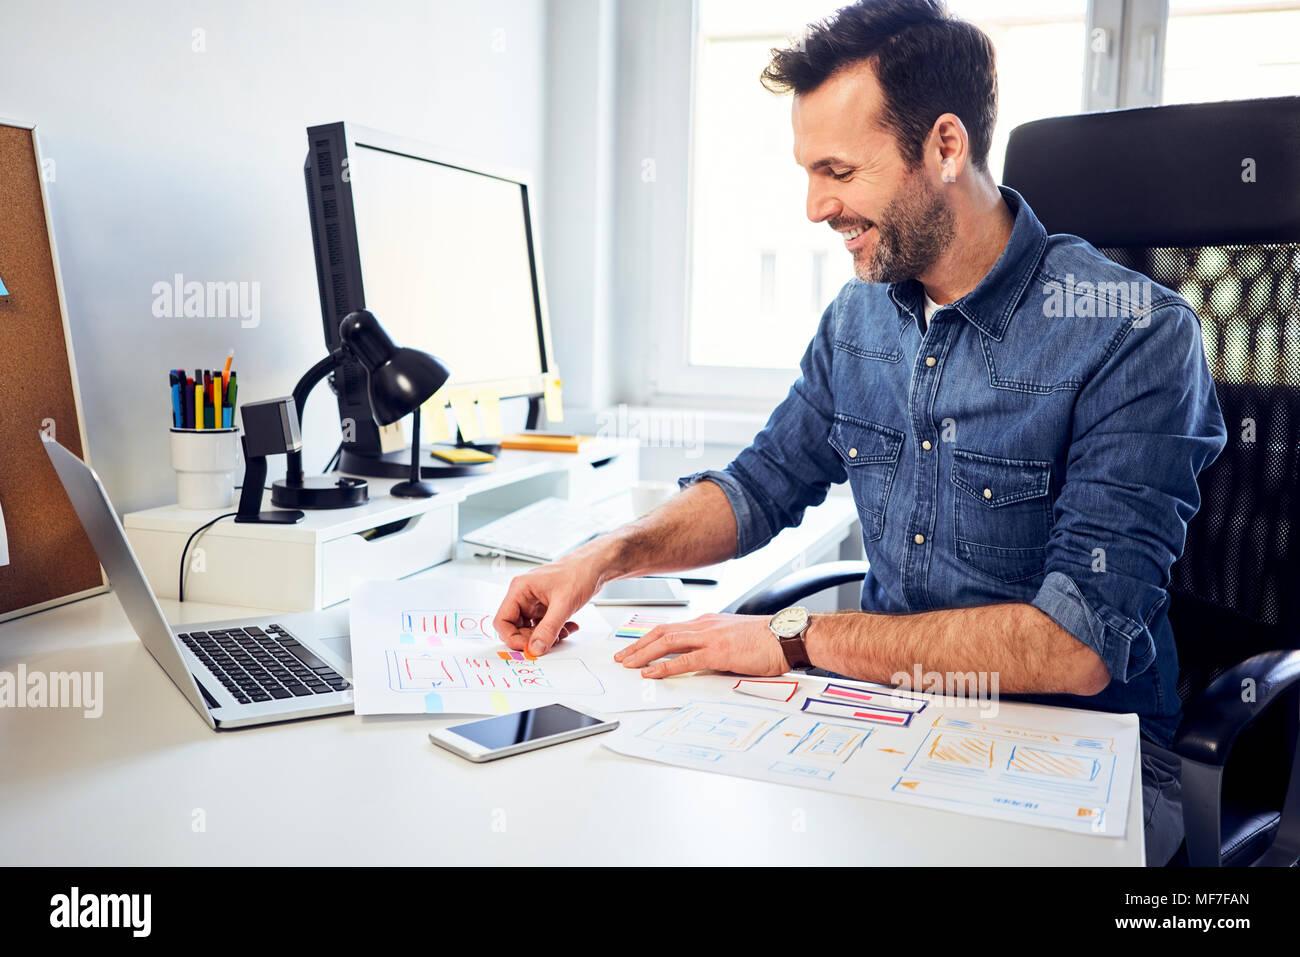 Smiling web designer travaillant sur le projet at desk in office Photo Stock